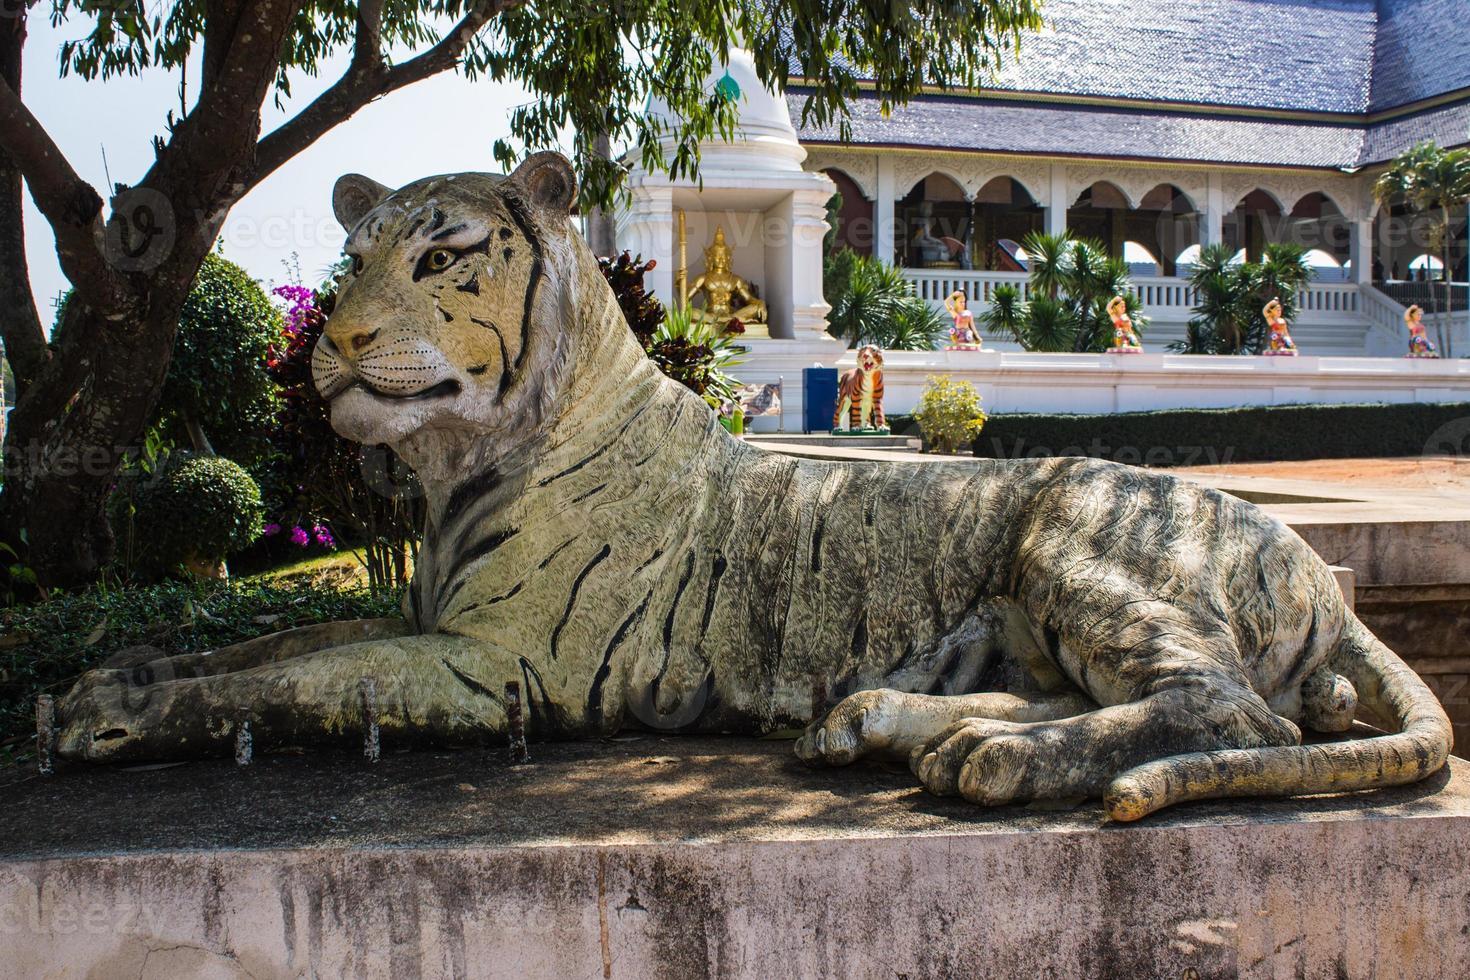 estátua de tigre no templo tailandês foto